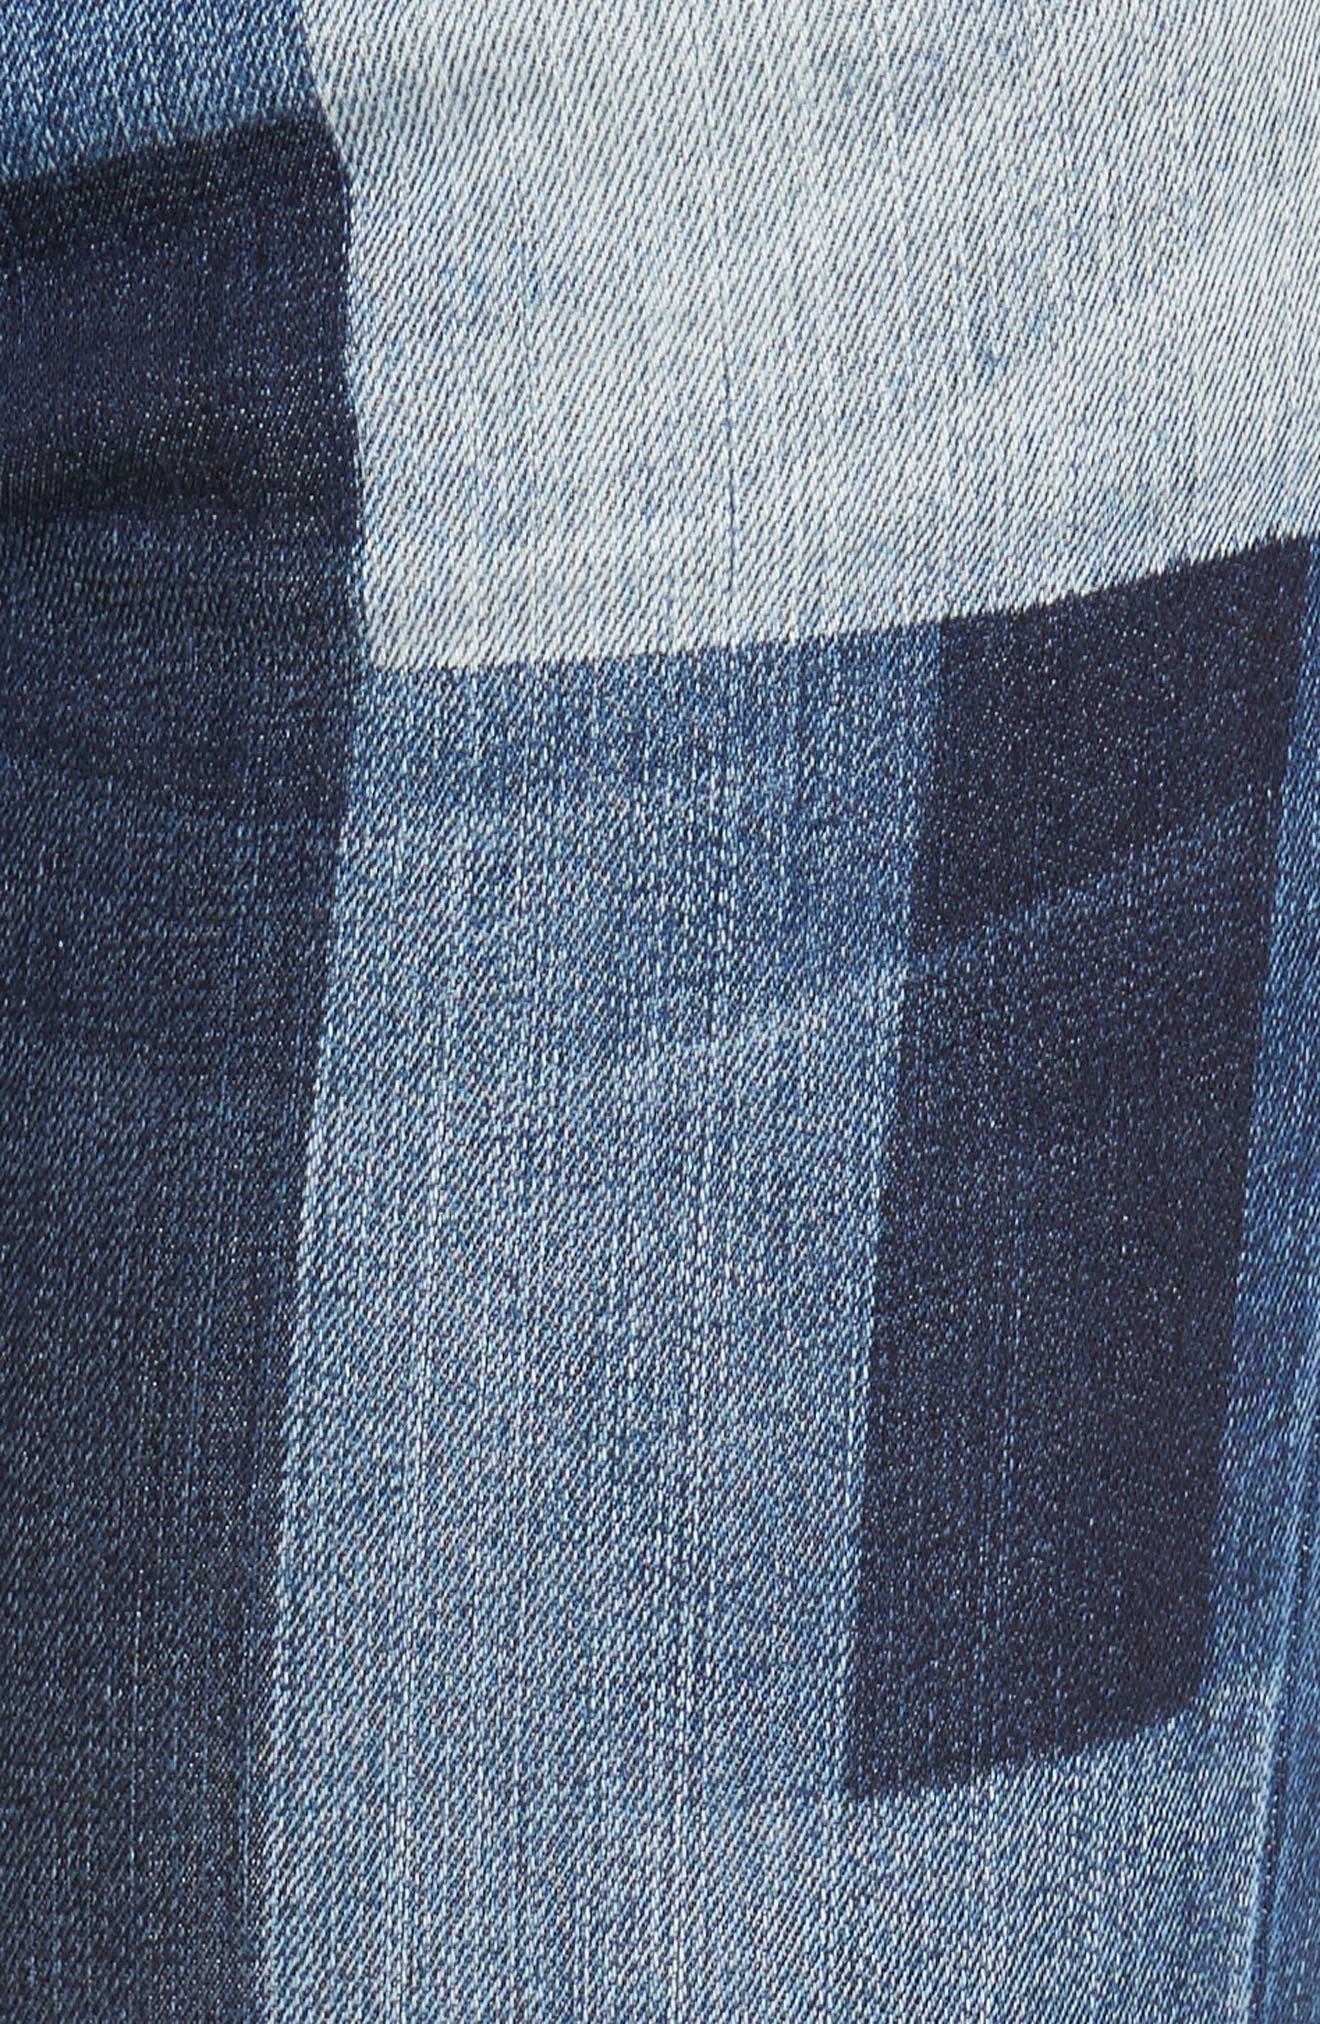 Patchwork Fade Skinny Jeans,                             Alternate thumbnail 5, color,                             Coequal / Dark Stone